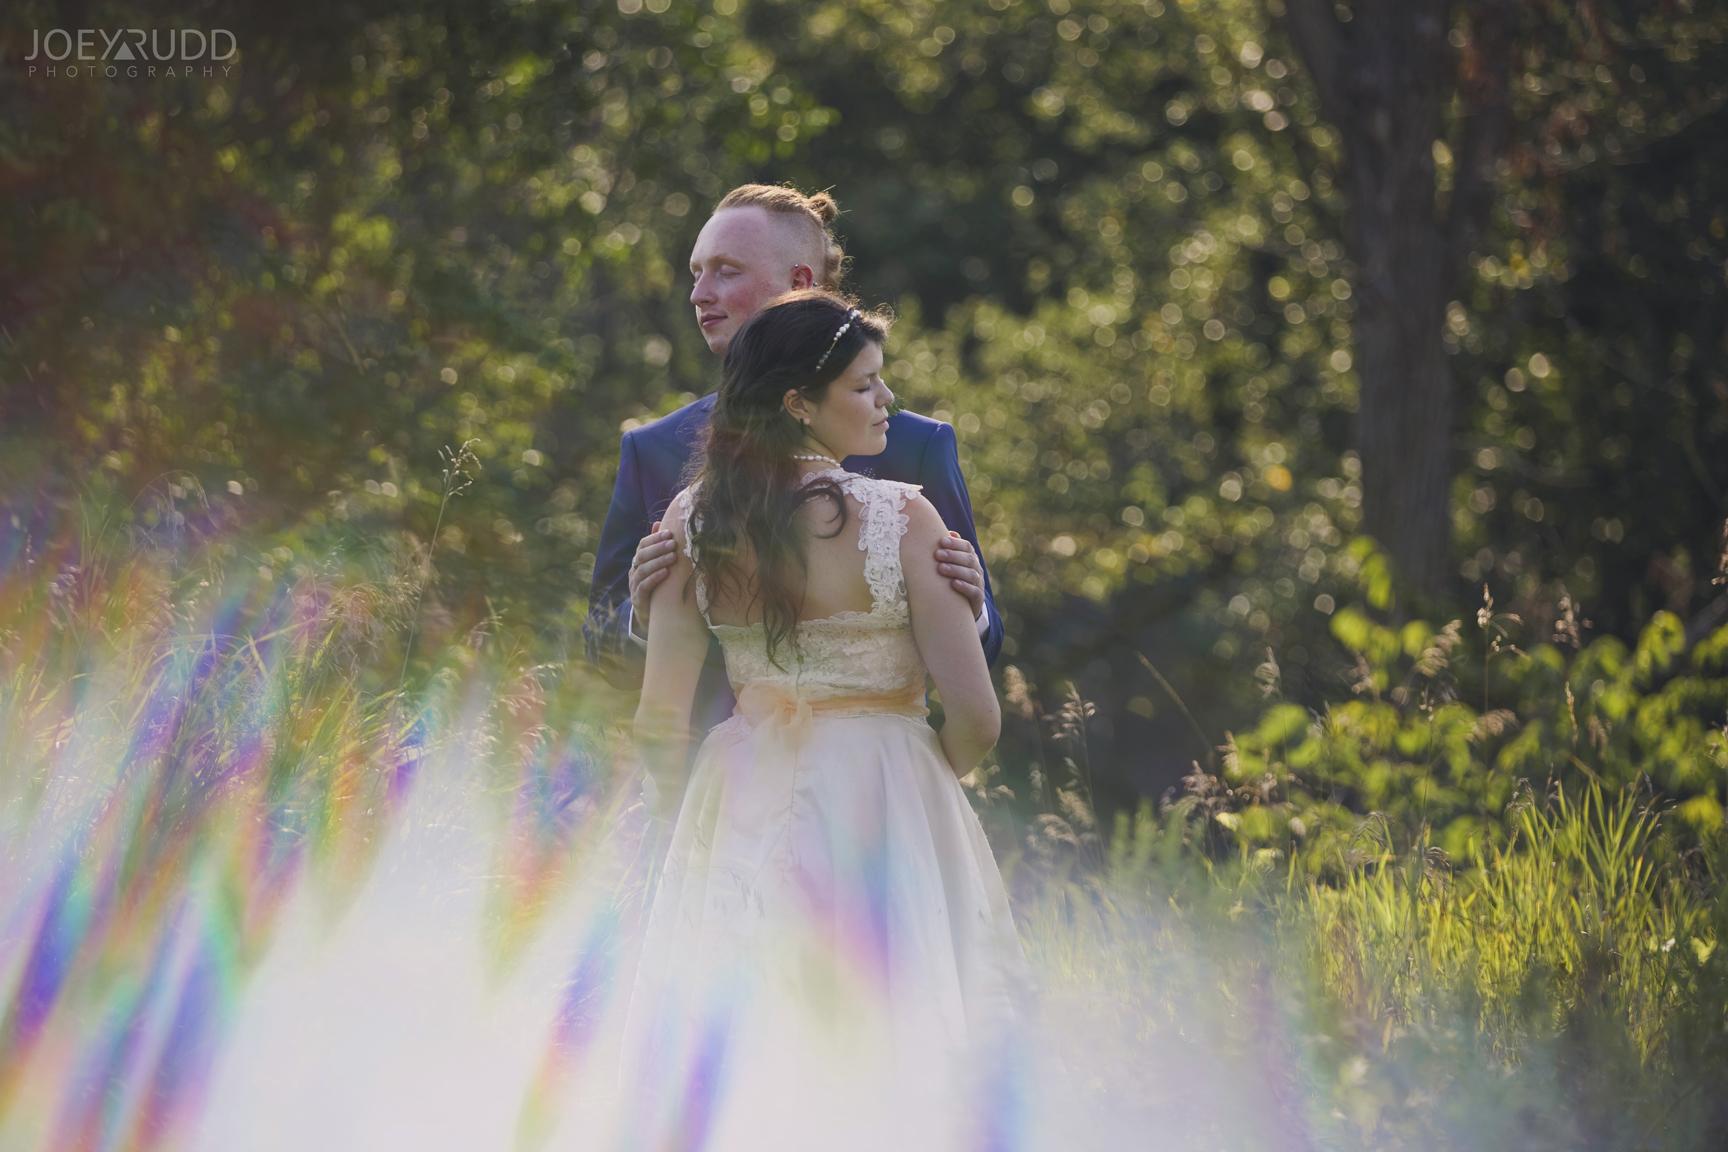 Backyard Kingston Wedding by Ottawa Wedding Photographer Joey Rudd Photography Prisming Creative Photo